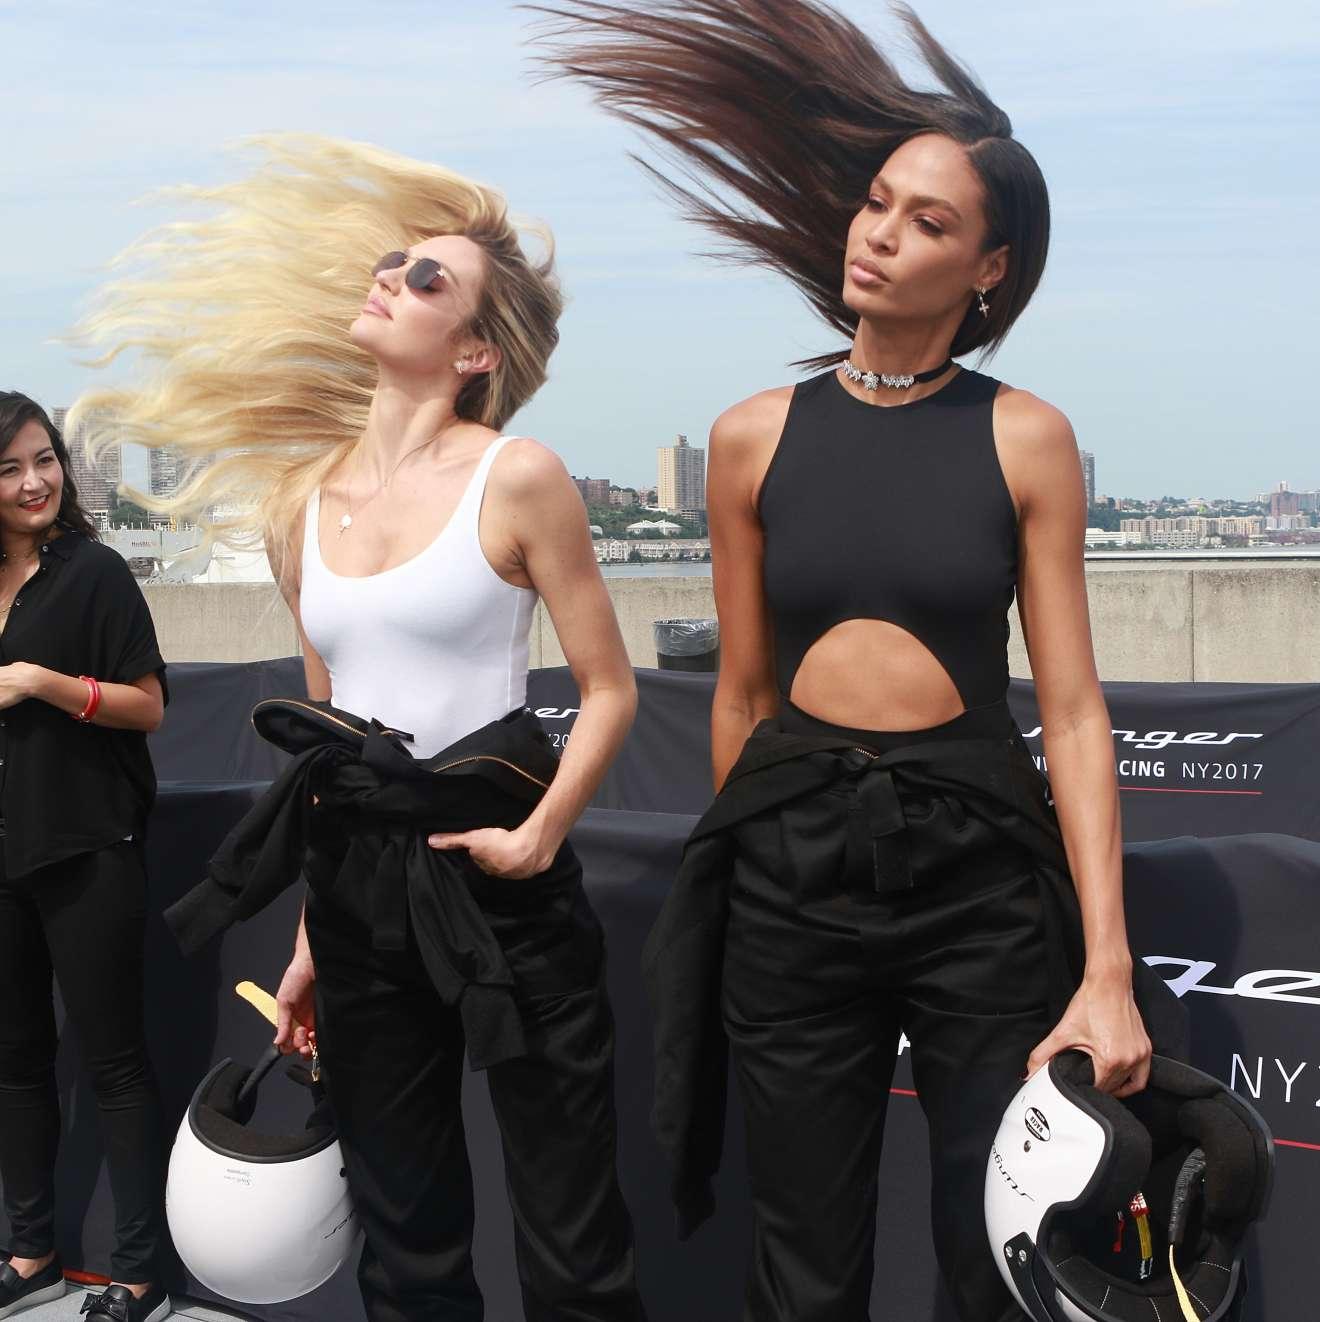 Candice Swanepoel - Kia Race the Runway Charity Event, New York Fashion Week 2017